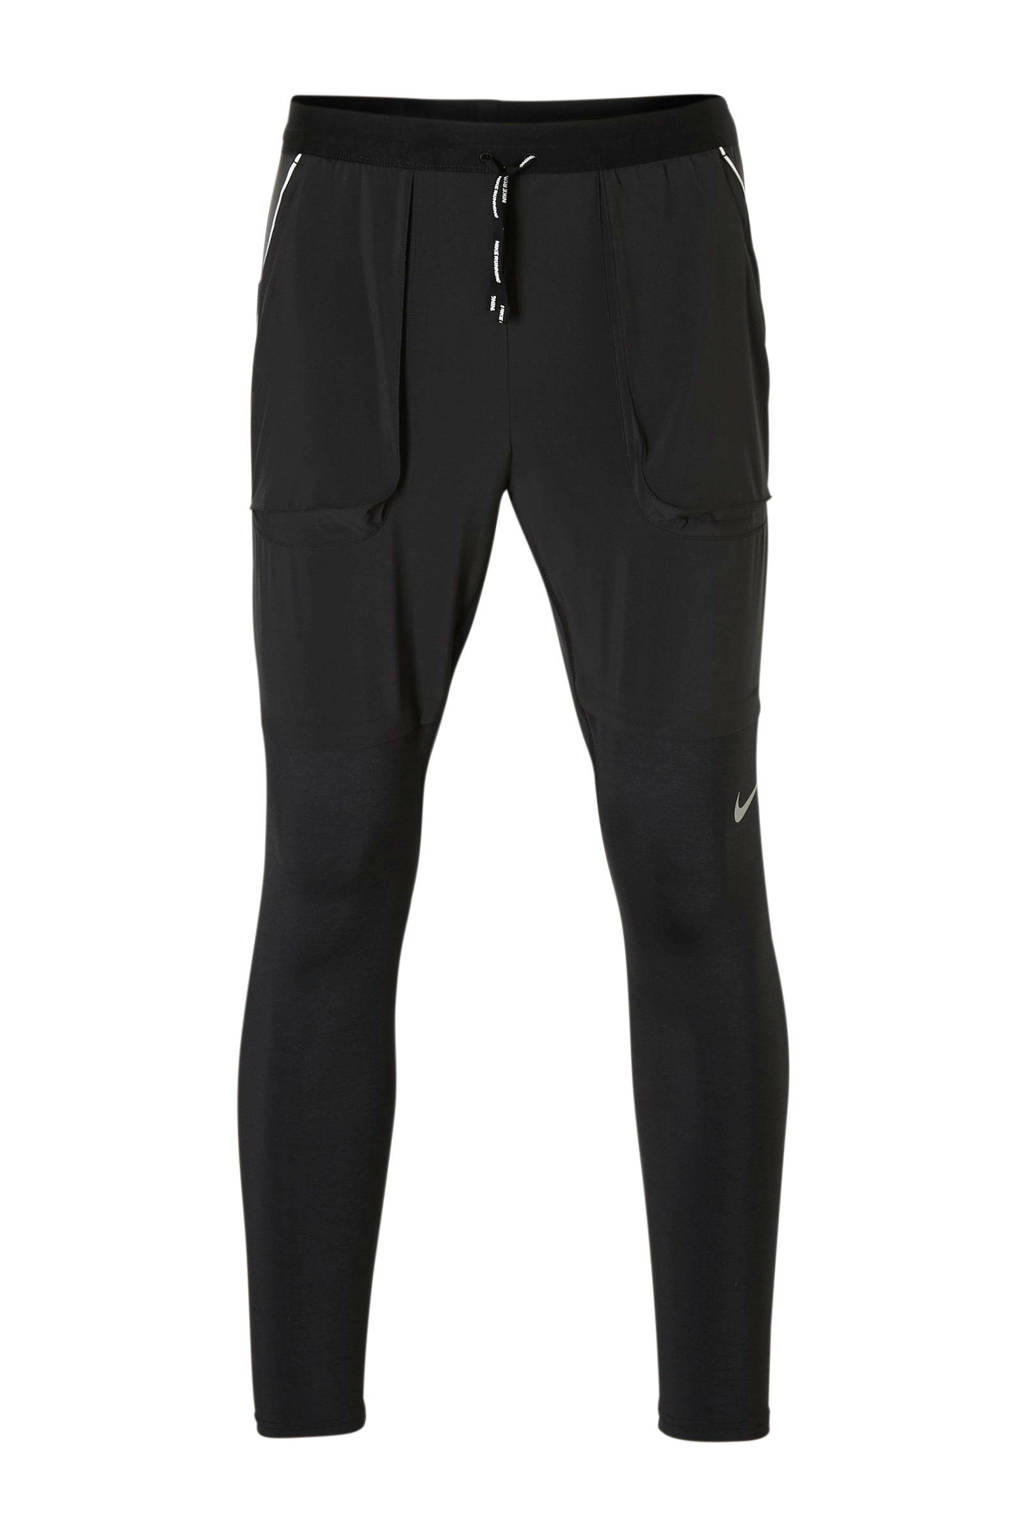 Nike   hardloopbroek, Zwart